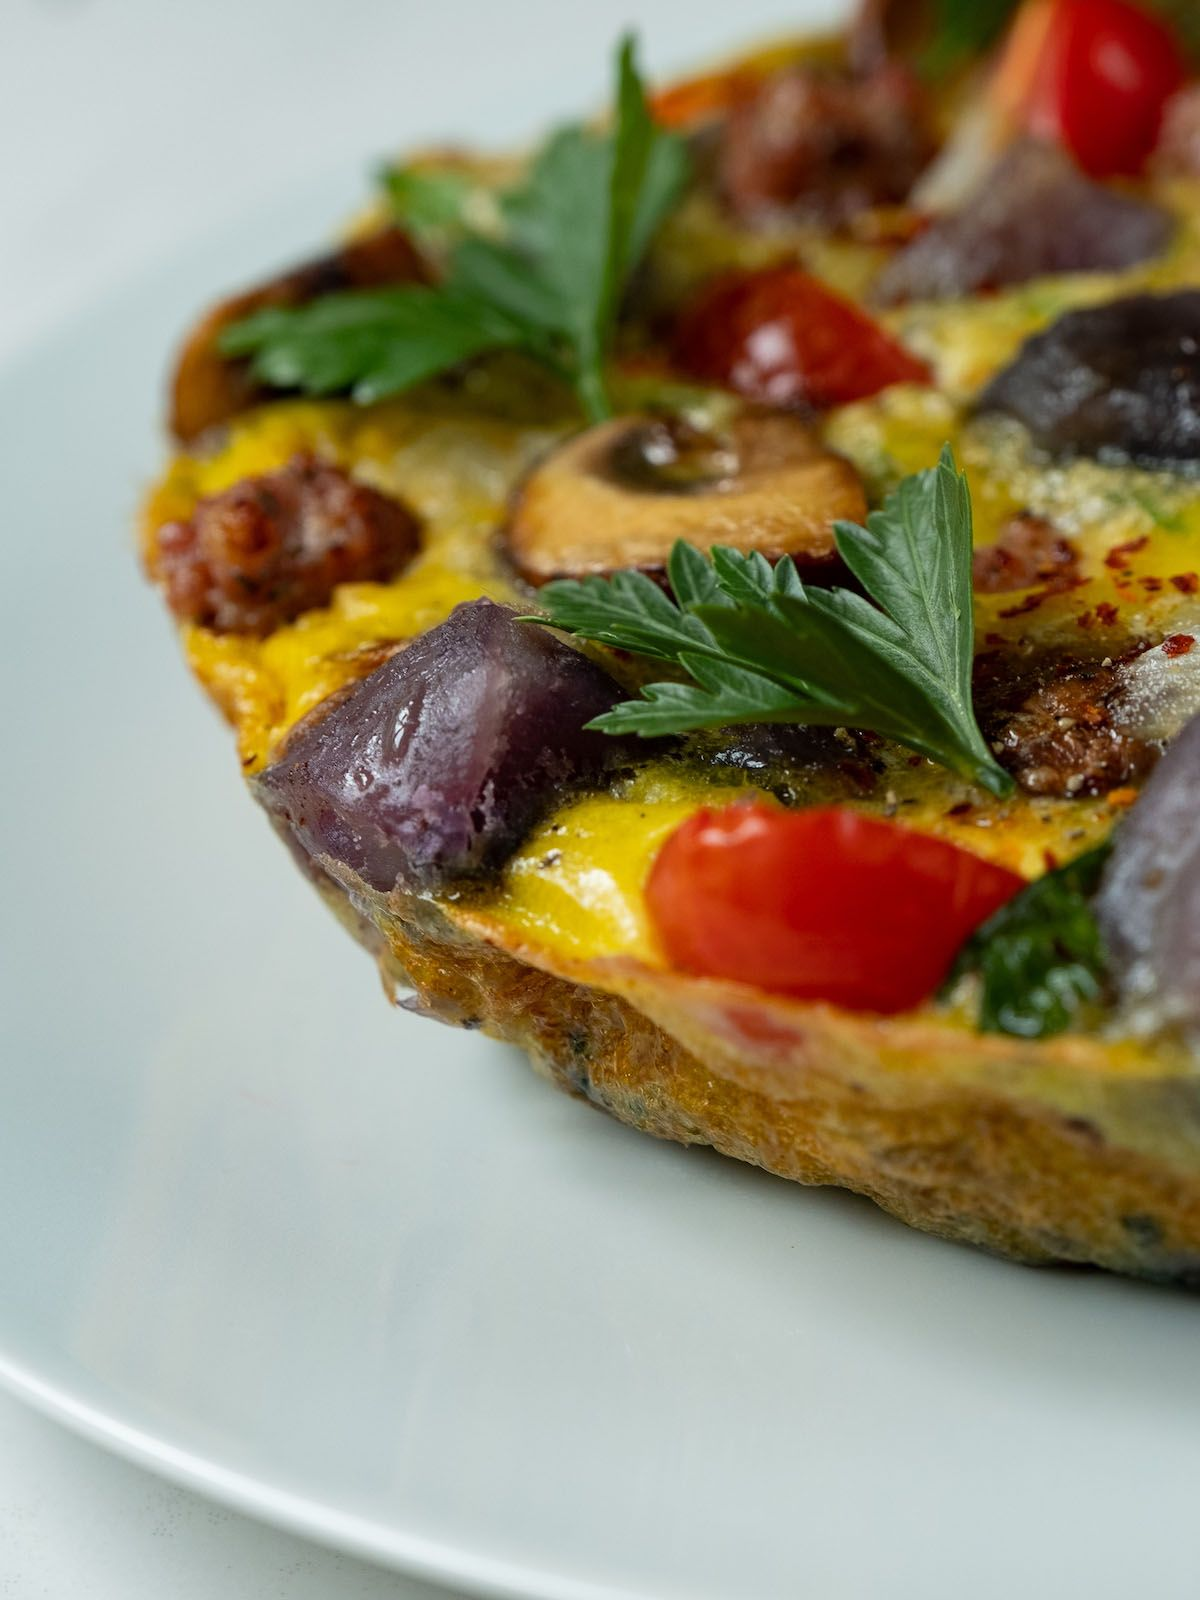 About Fuel, Foodblog, Rezept, Tortilla, Tomaten, Ei, Petersilie, Zwiebeln, Chili